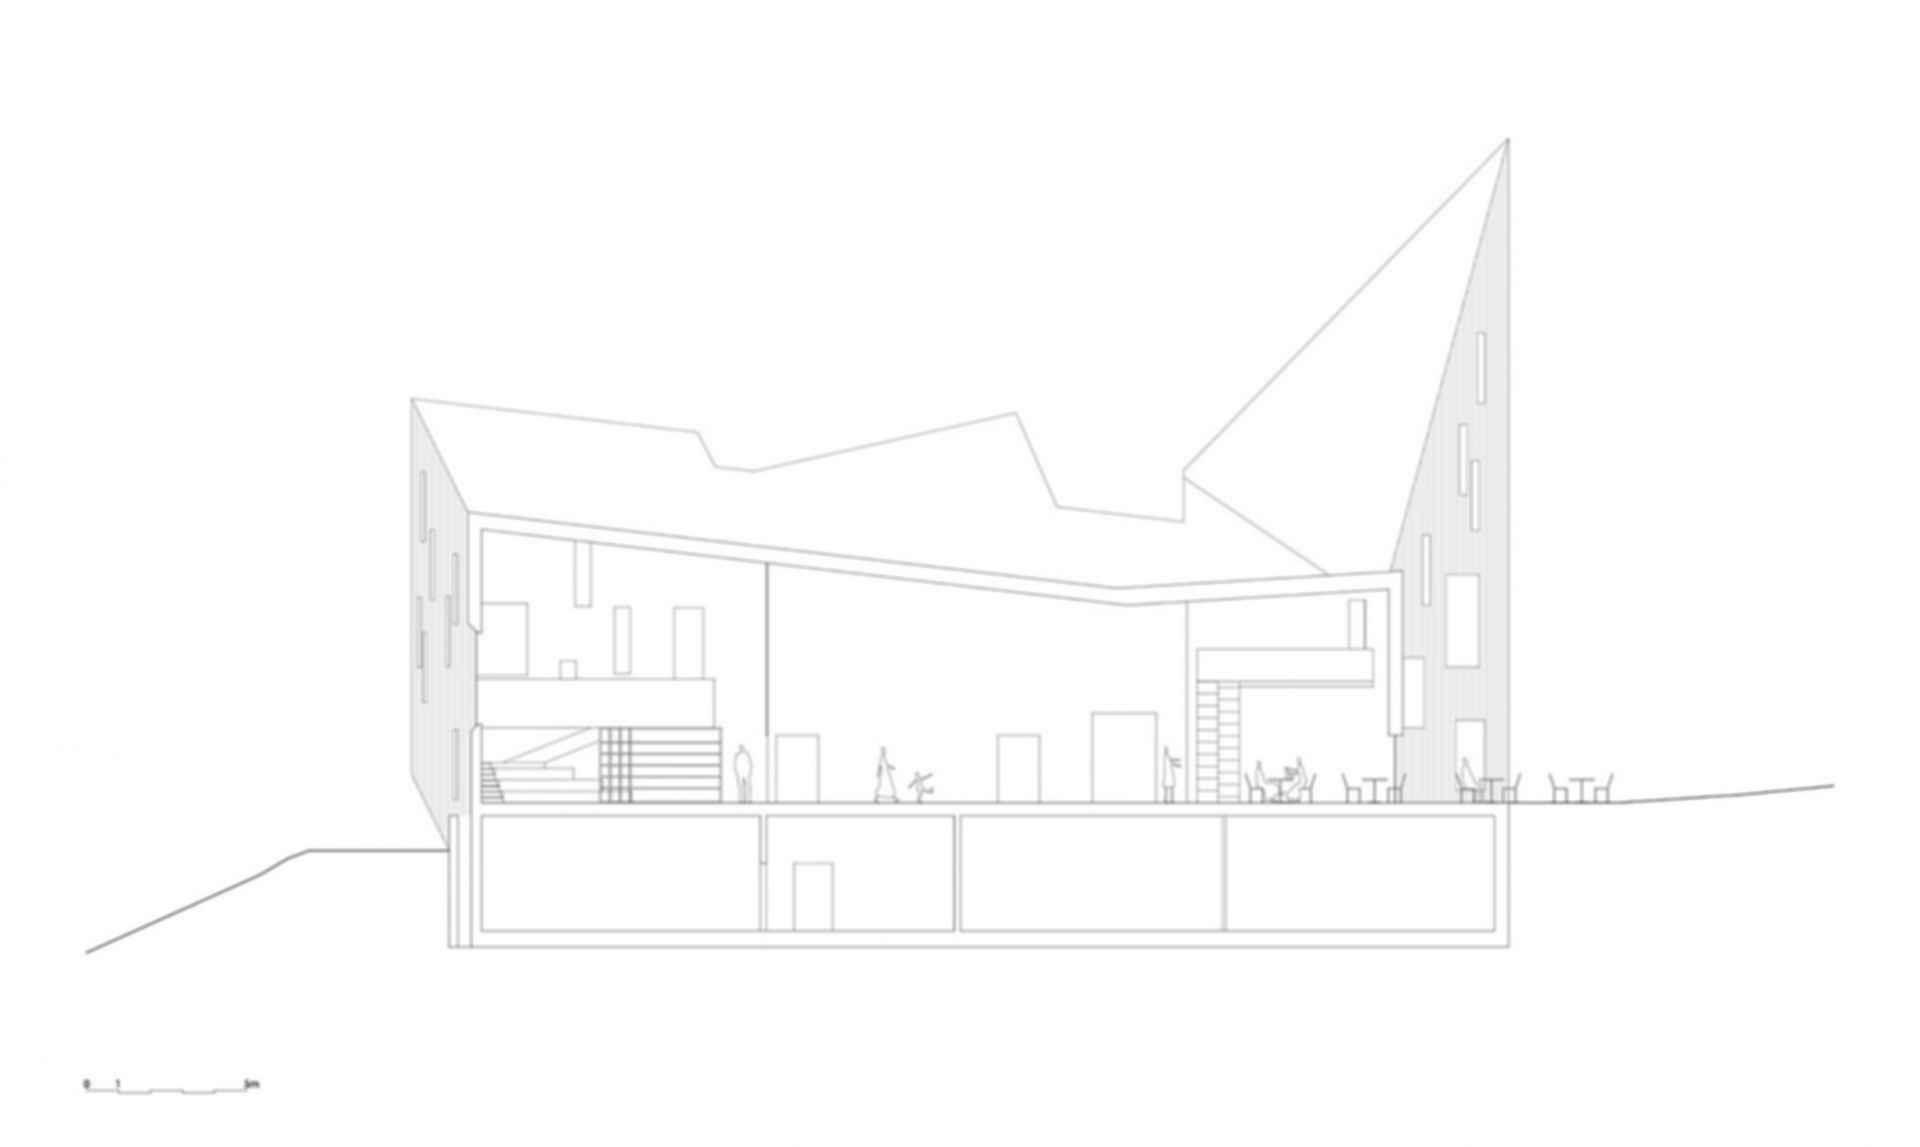 Romsdal Folk Museum - Concept Design